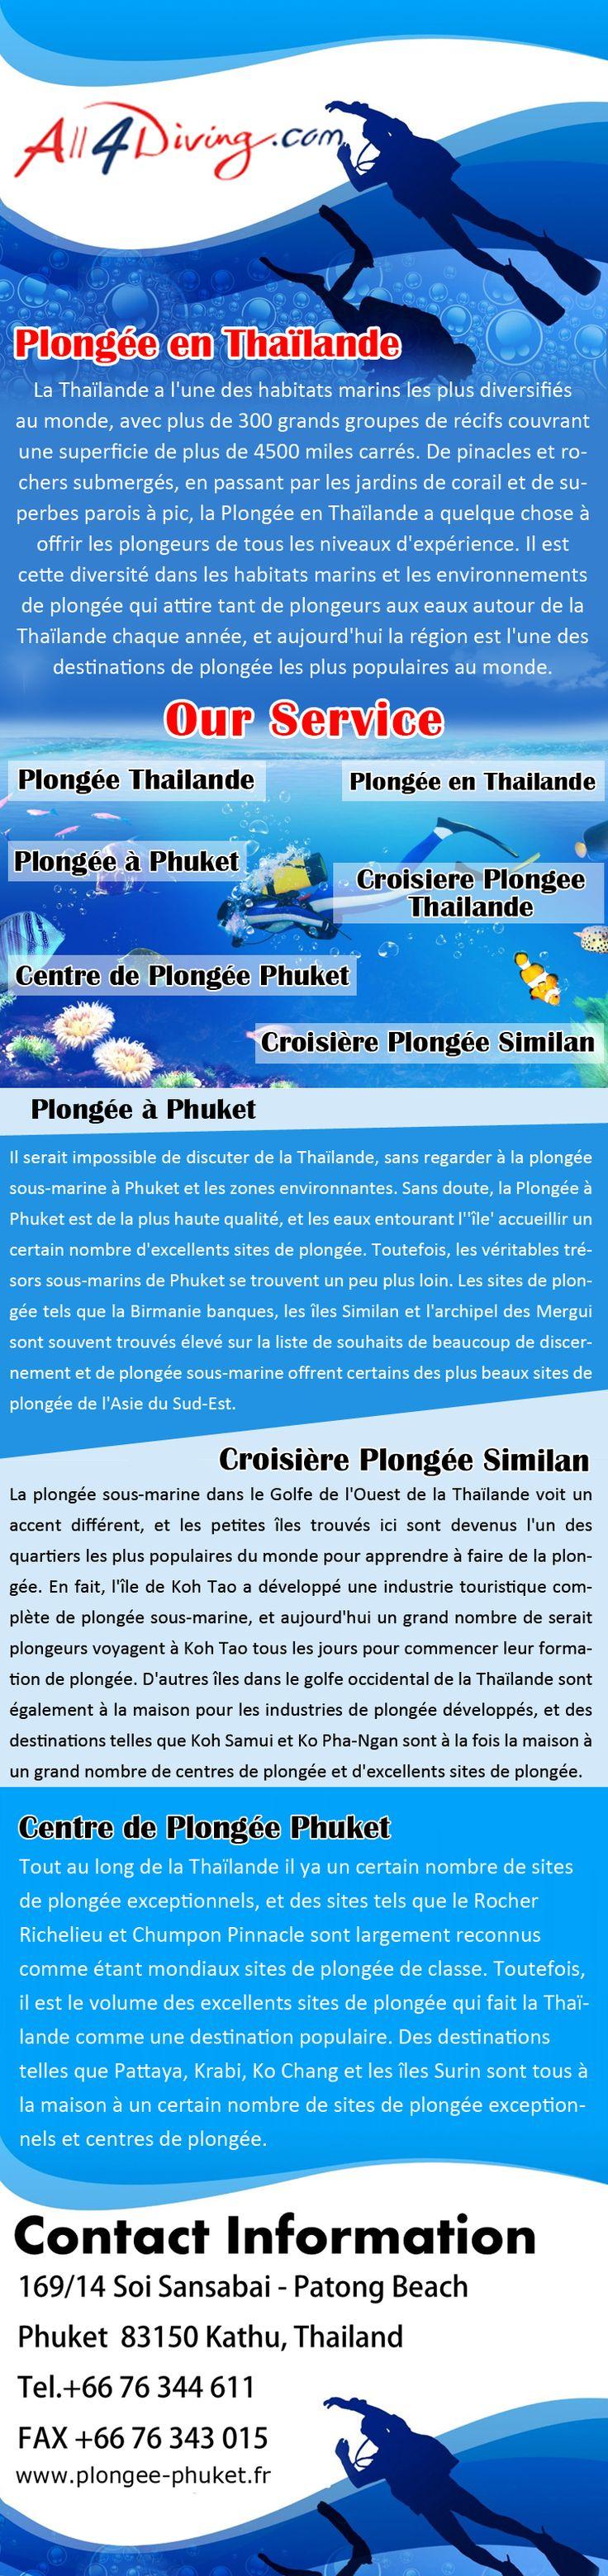 Meilleur Club de Plongée Phuket français: Plongée à Phuket, plongée thailande,croisiere plongee thailande,plongée en thailande, croisiere plongee similan,centre de plongée phuket. Visit:- http://www.plongee-phuket.fr/